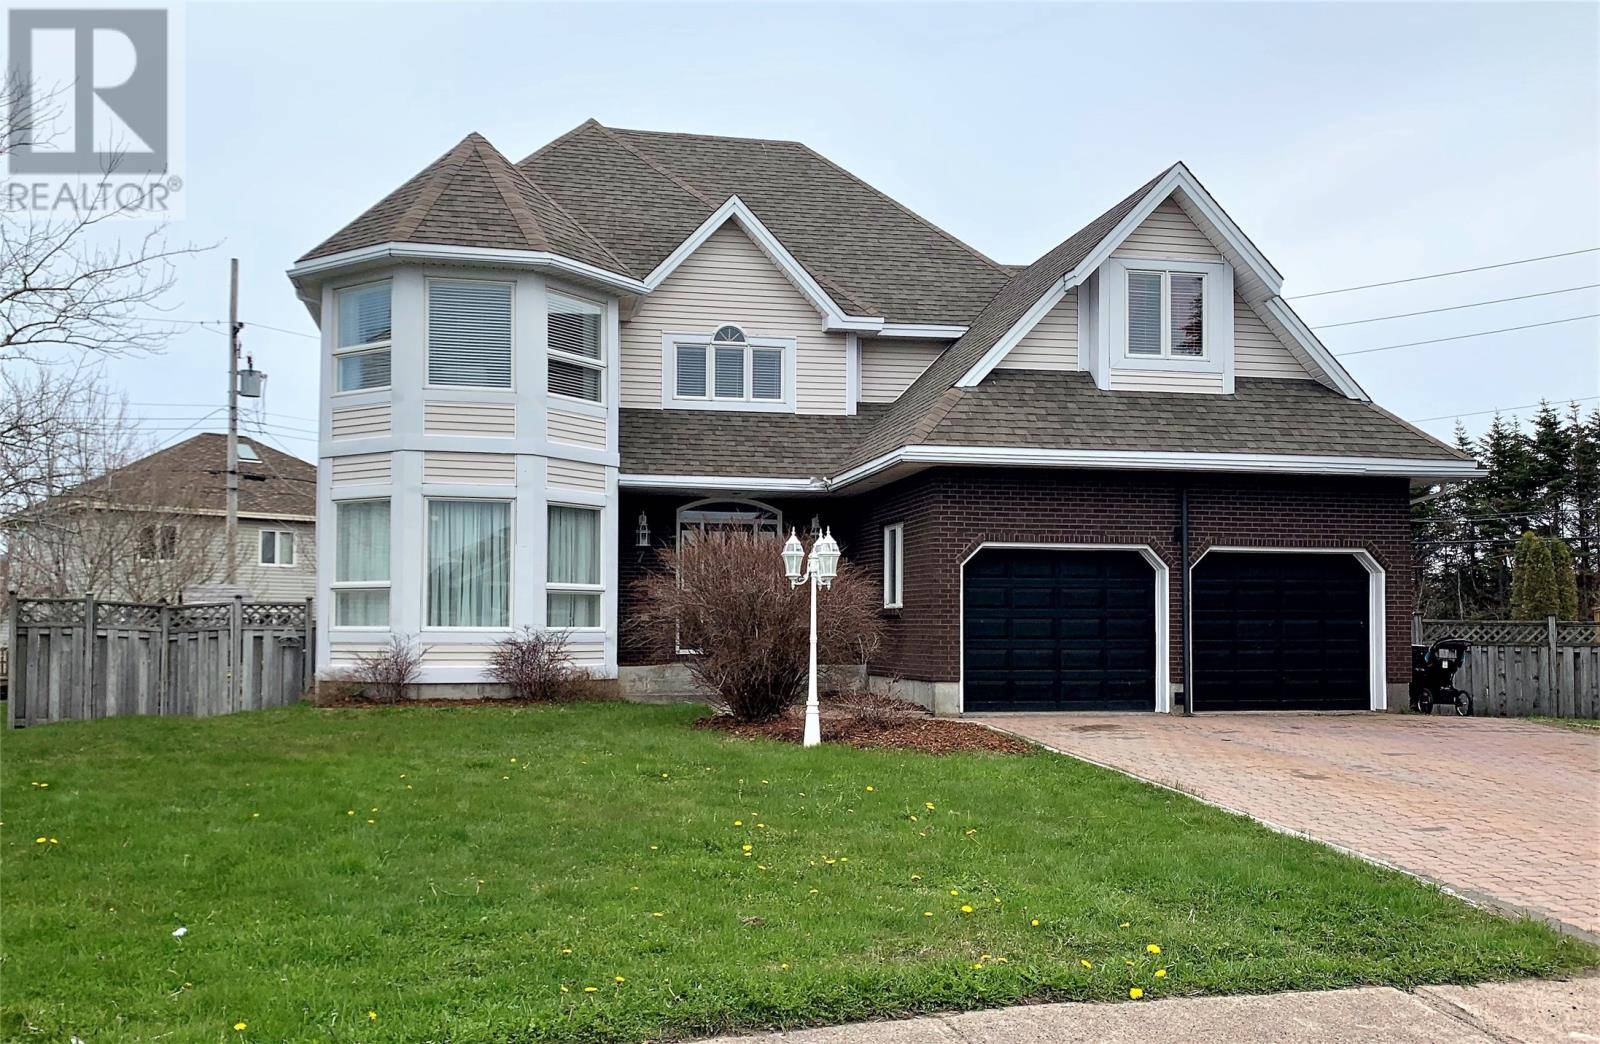 House for sale at 7 Gardiner Pl St John's Newfoundland - MLS: 1197040